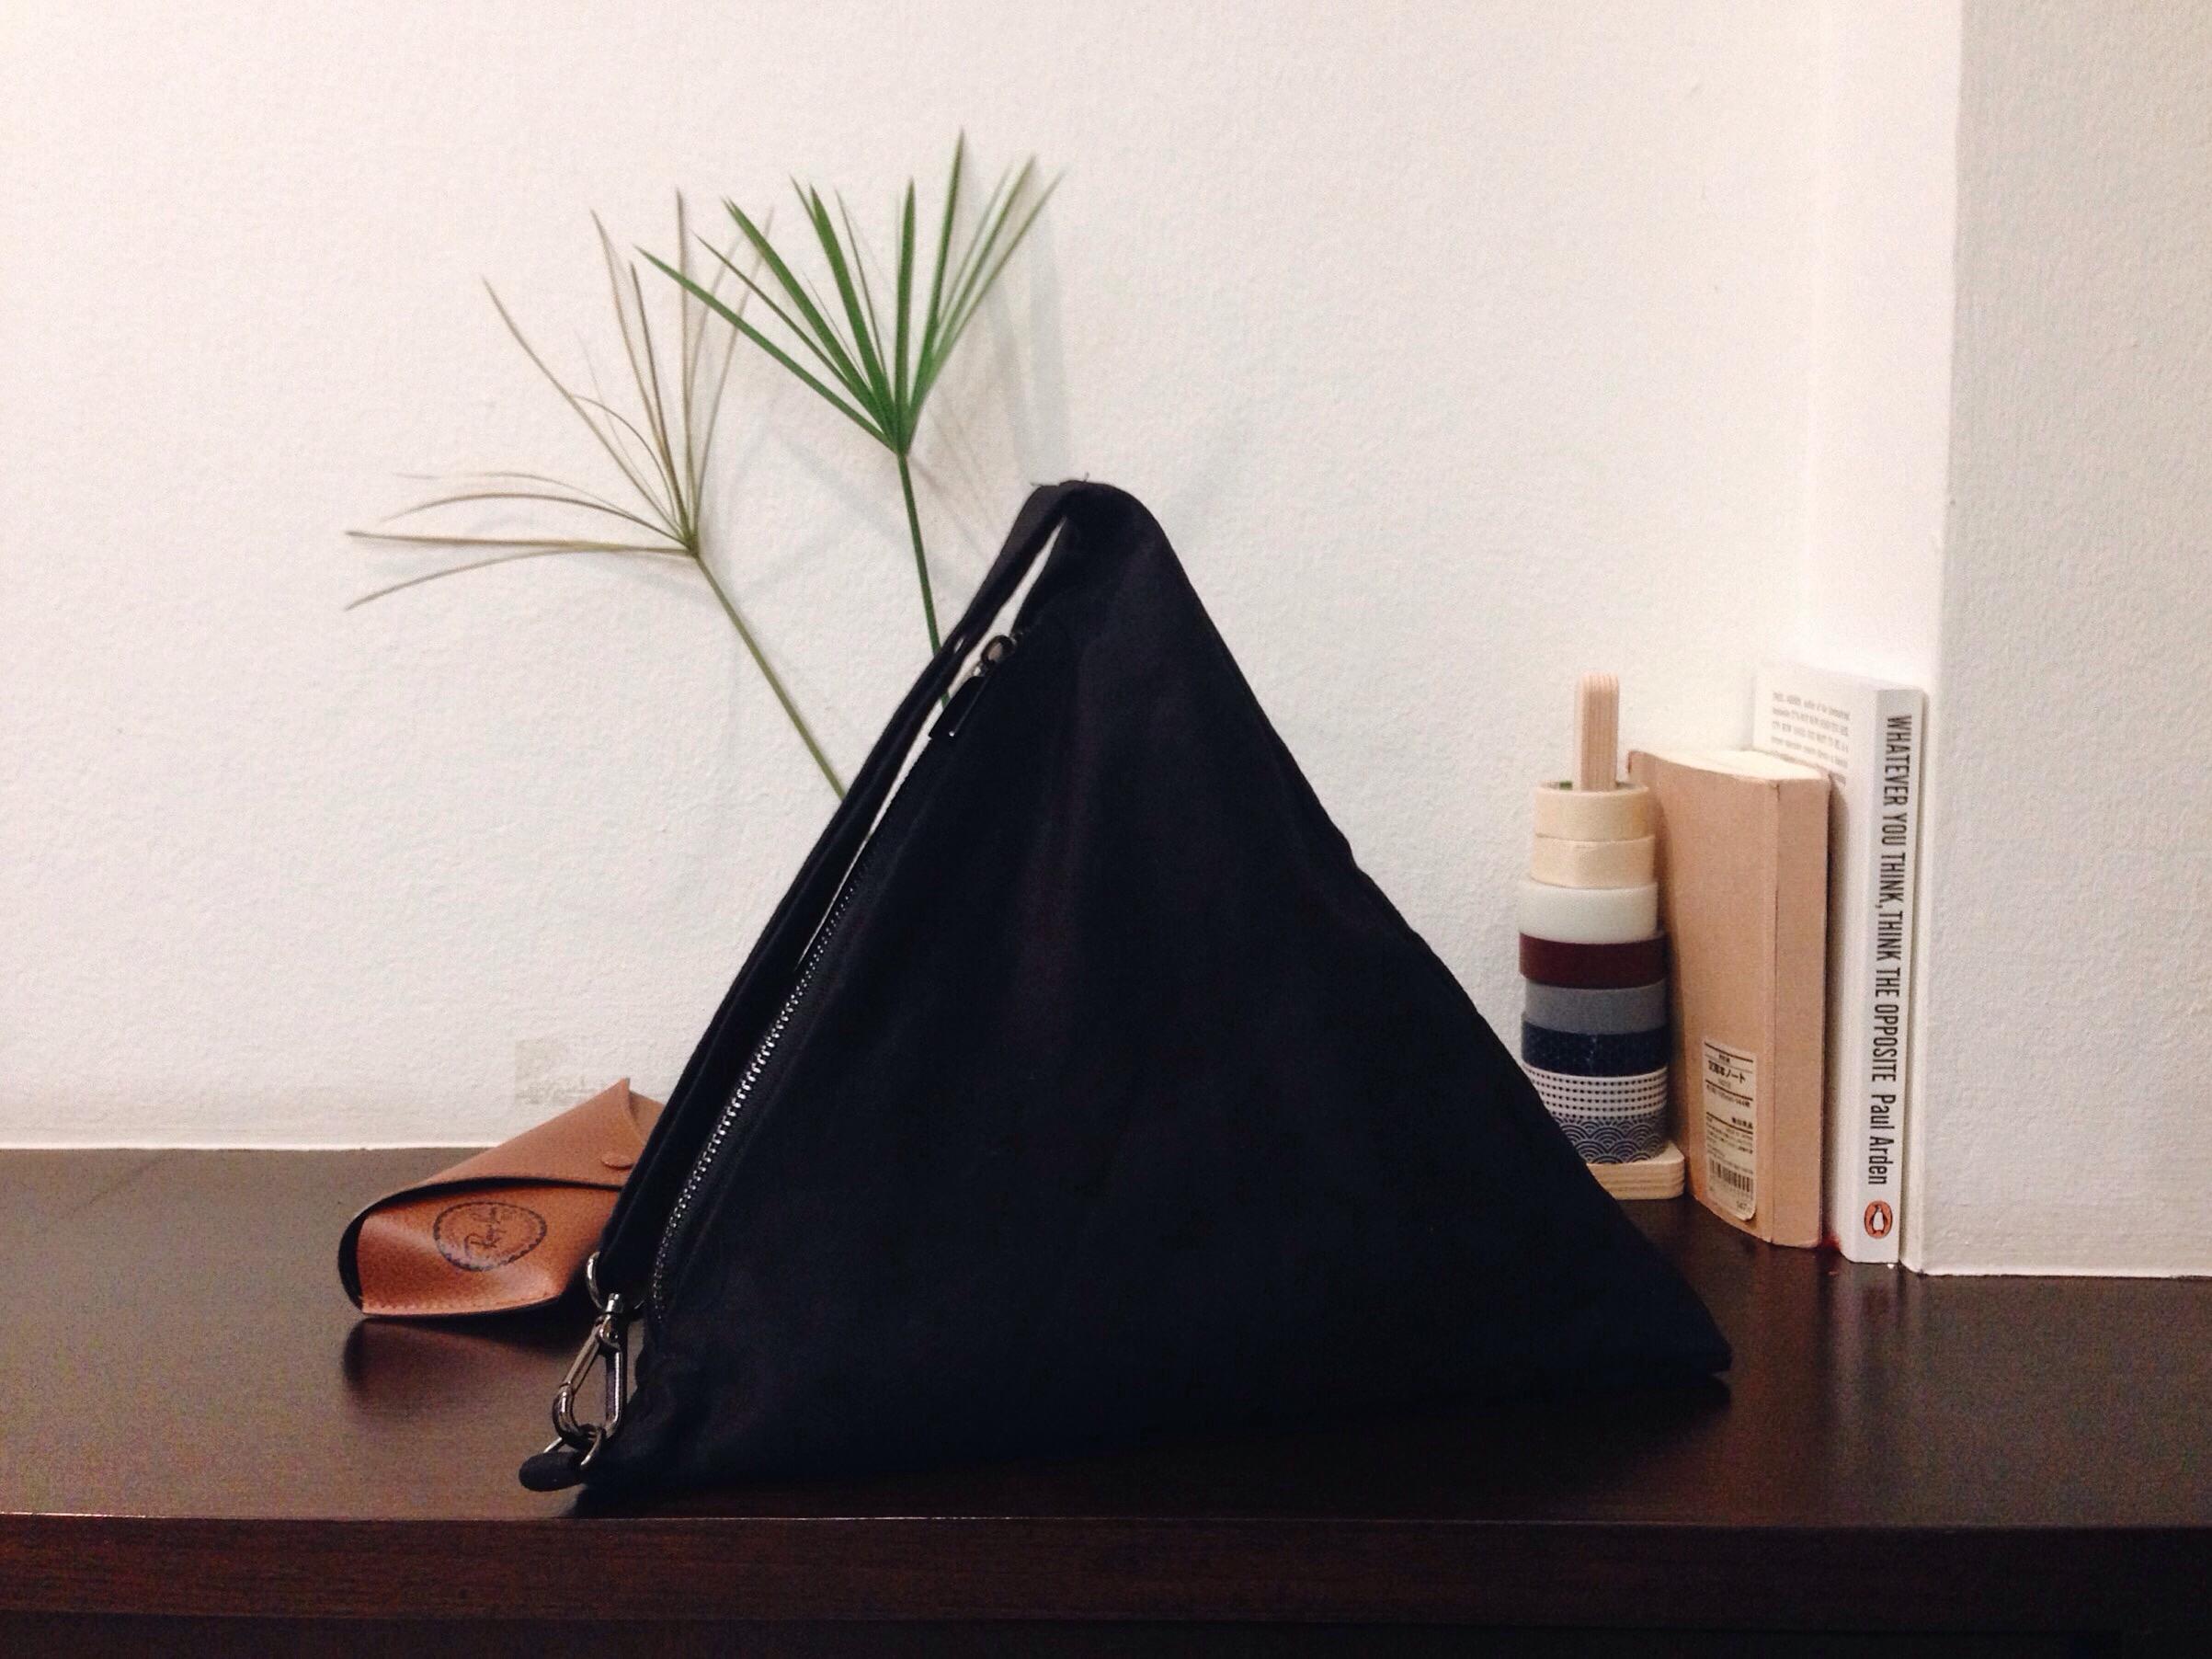 chapiee,chimaki,bag,fashion,shopping,black,minimal,triangle,design